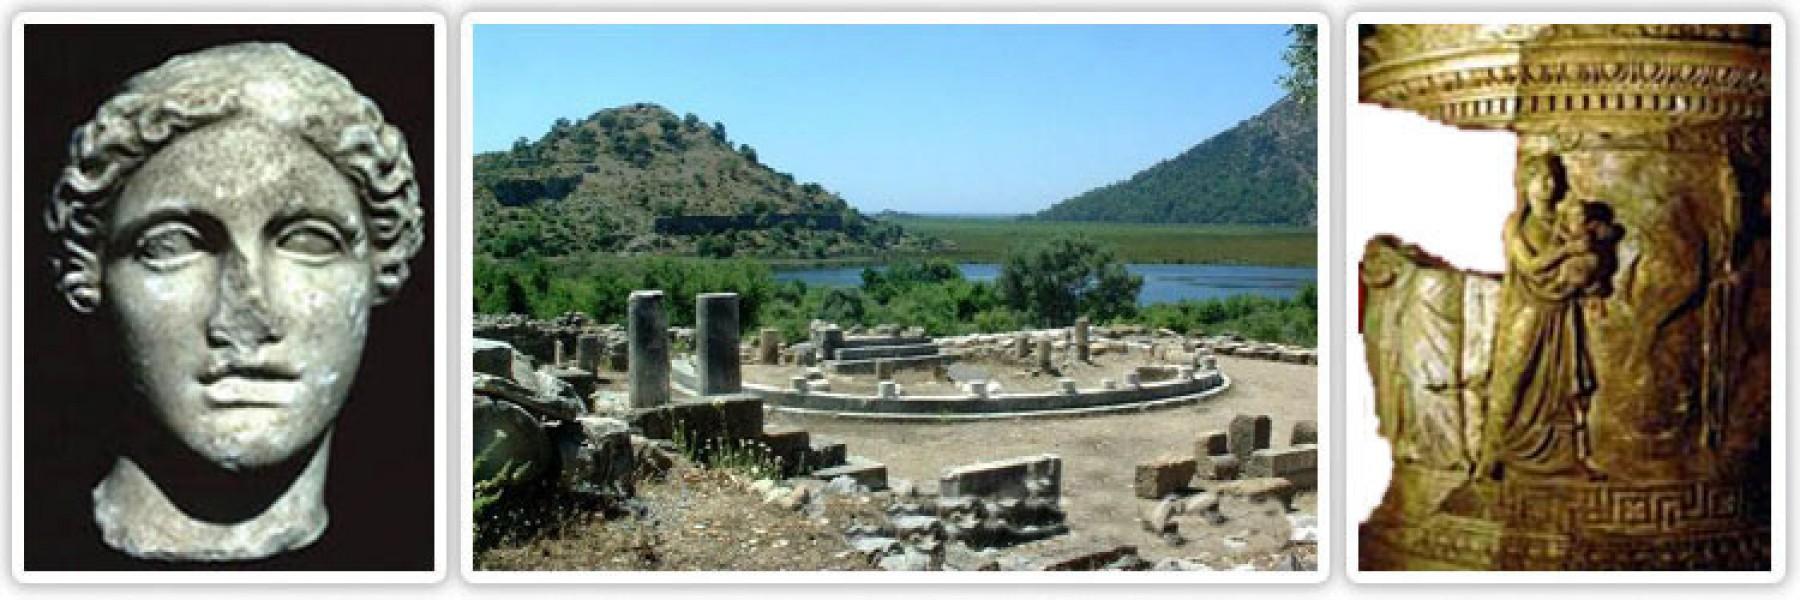 dalyan kaunos antik şehir harabeleri